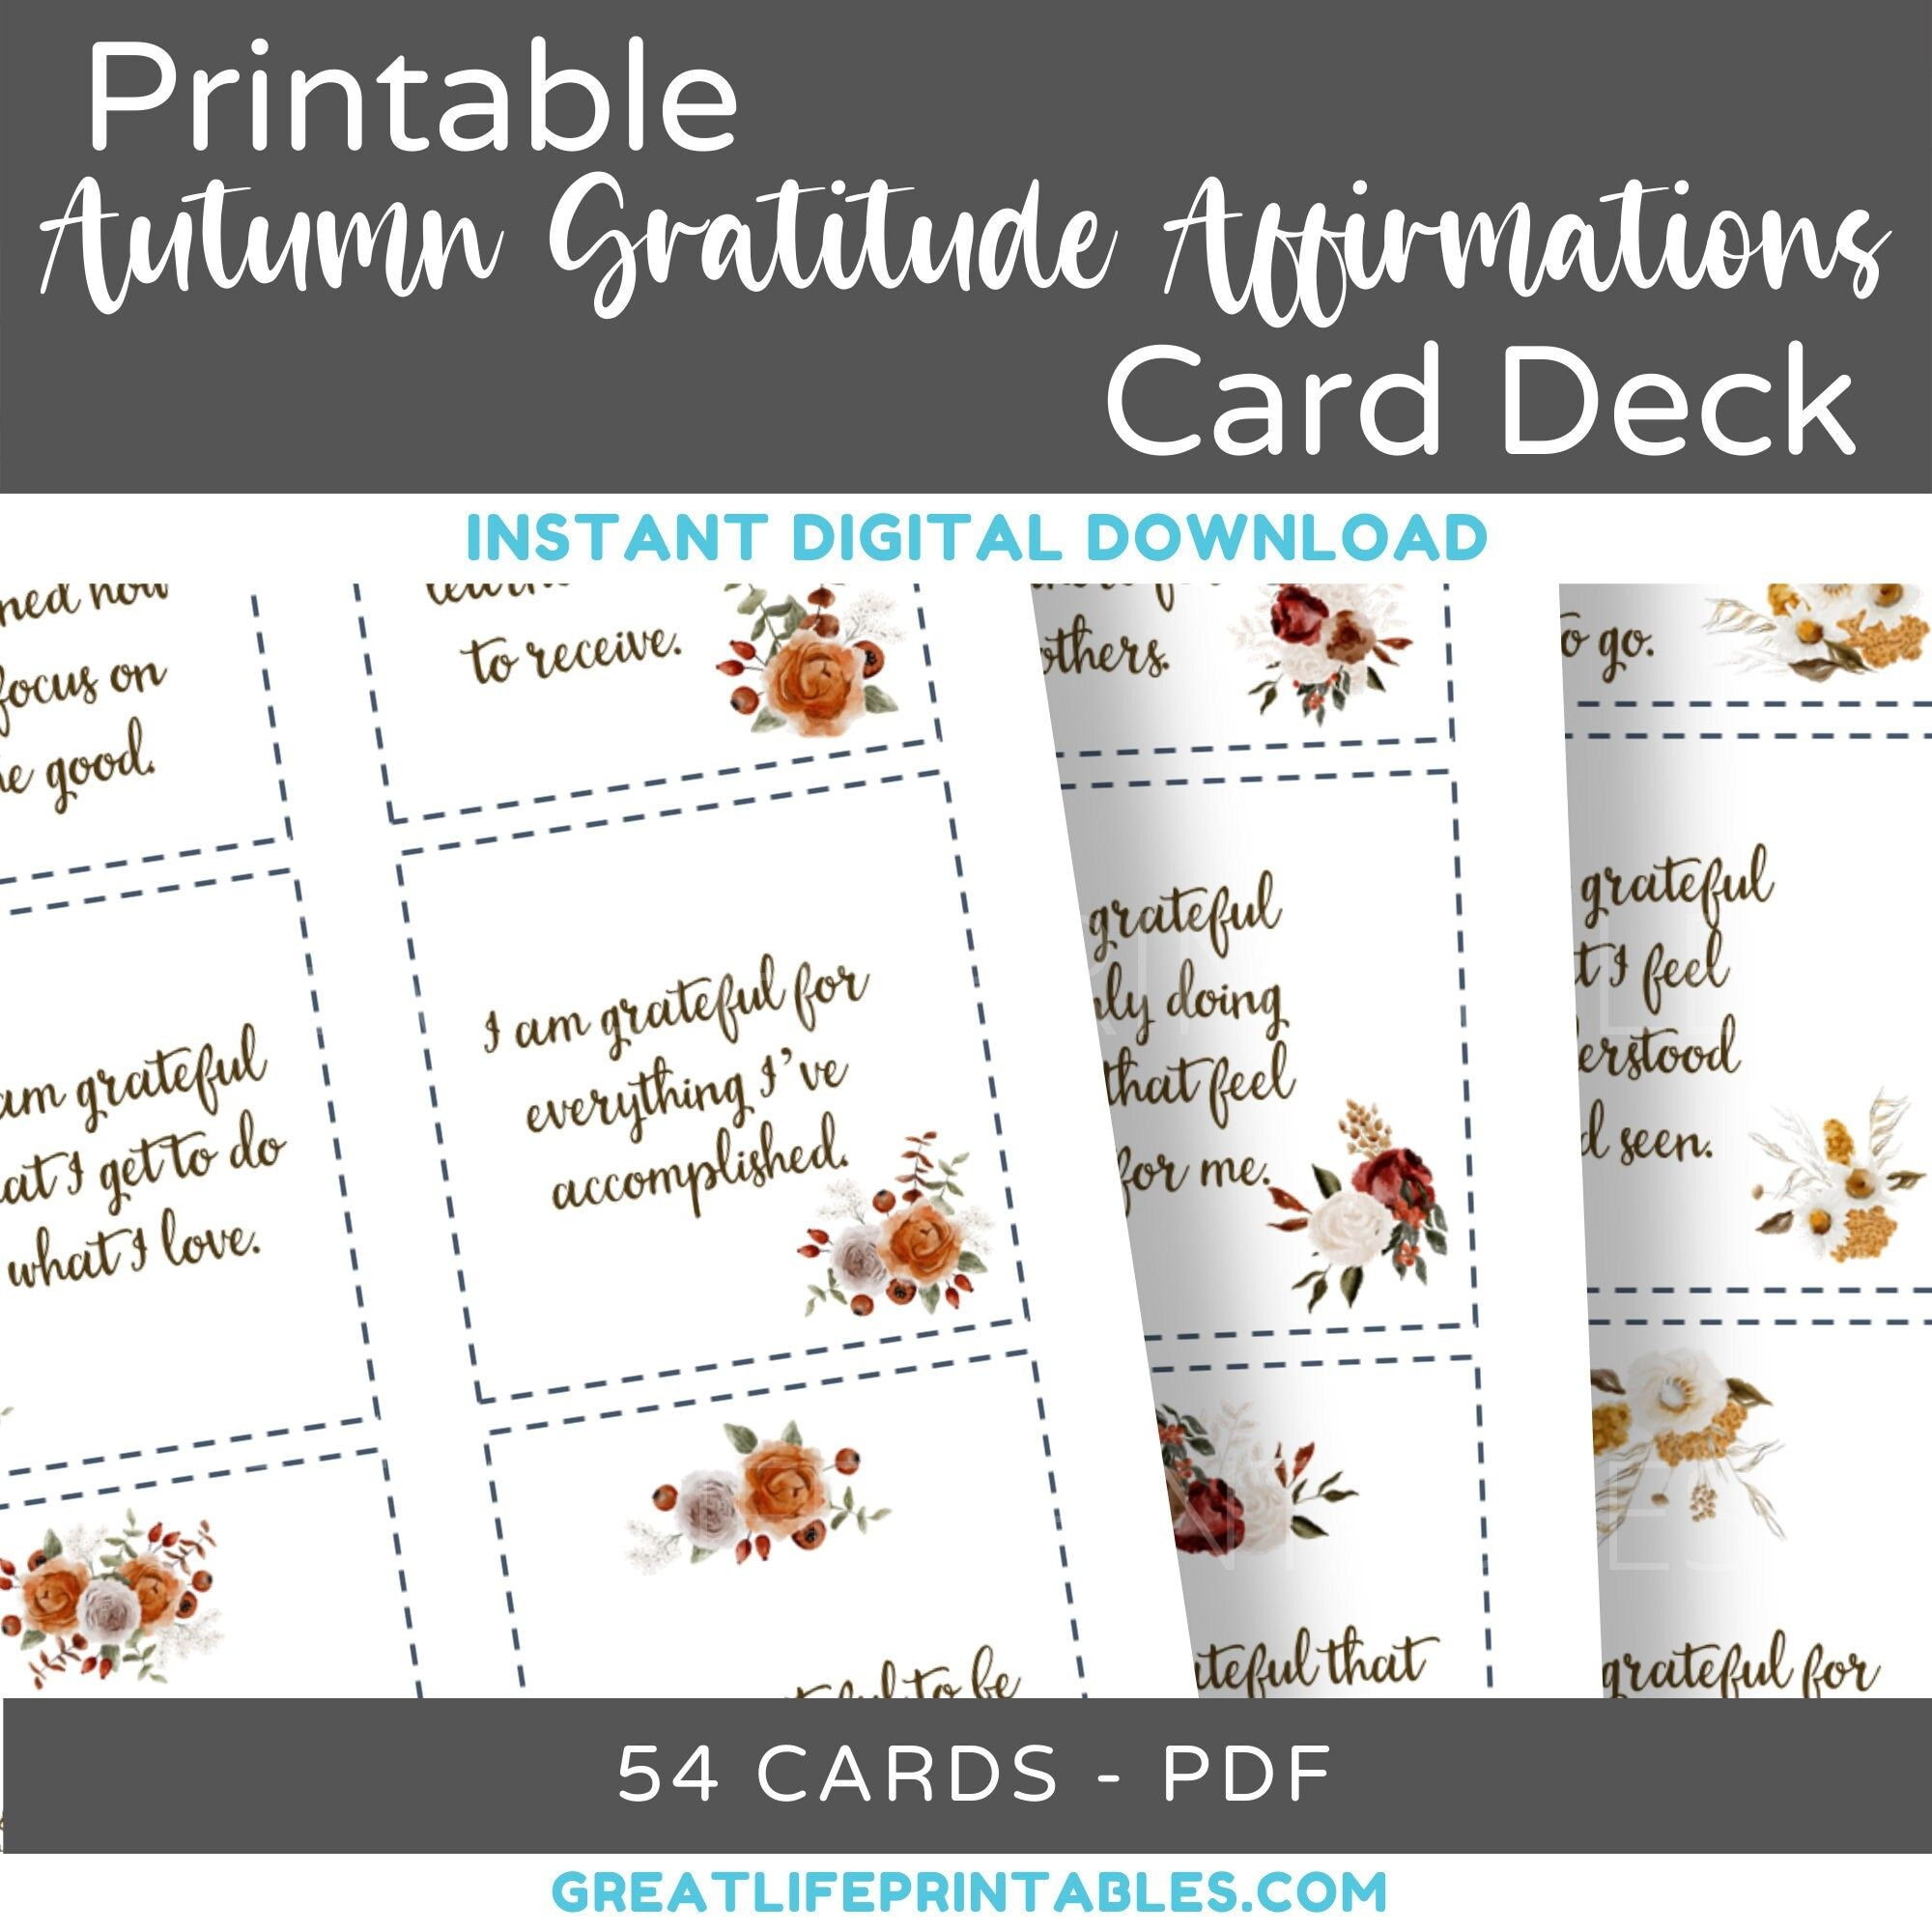 Printable Gratitude Card Deck, Gratitude Affirmations, Autumn, Thanksgiving, Affirmation Card Deck, Appreciation, Instant Download, PDF